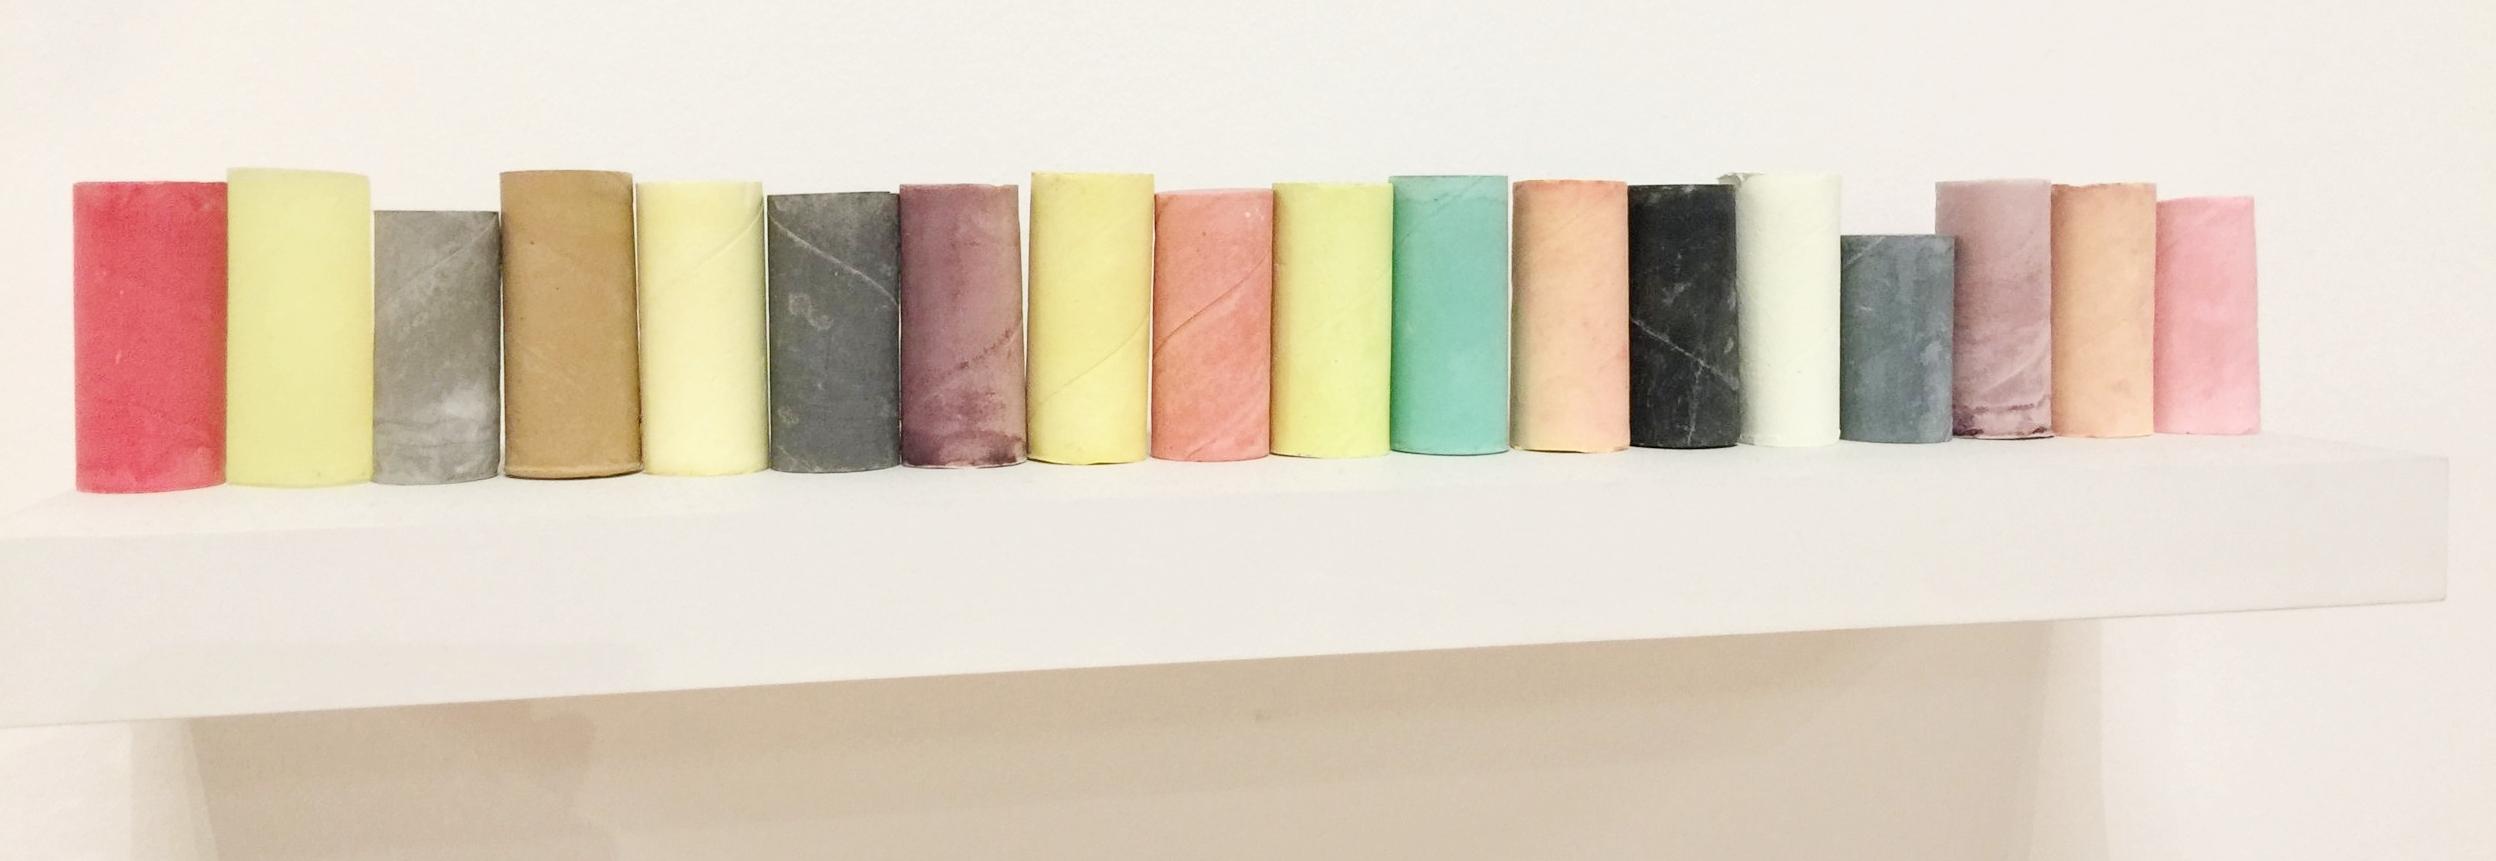 Rachel Whiteread:Coloured objects 2007-8